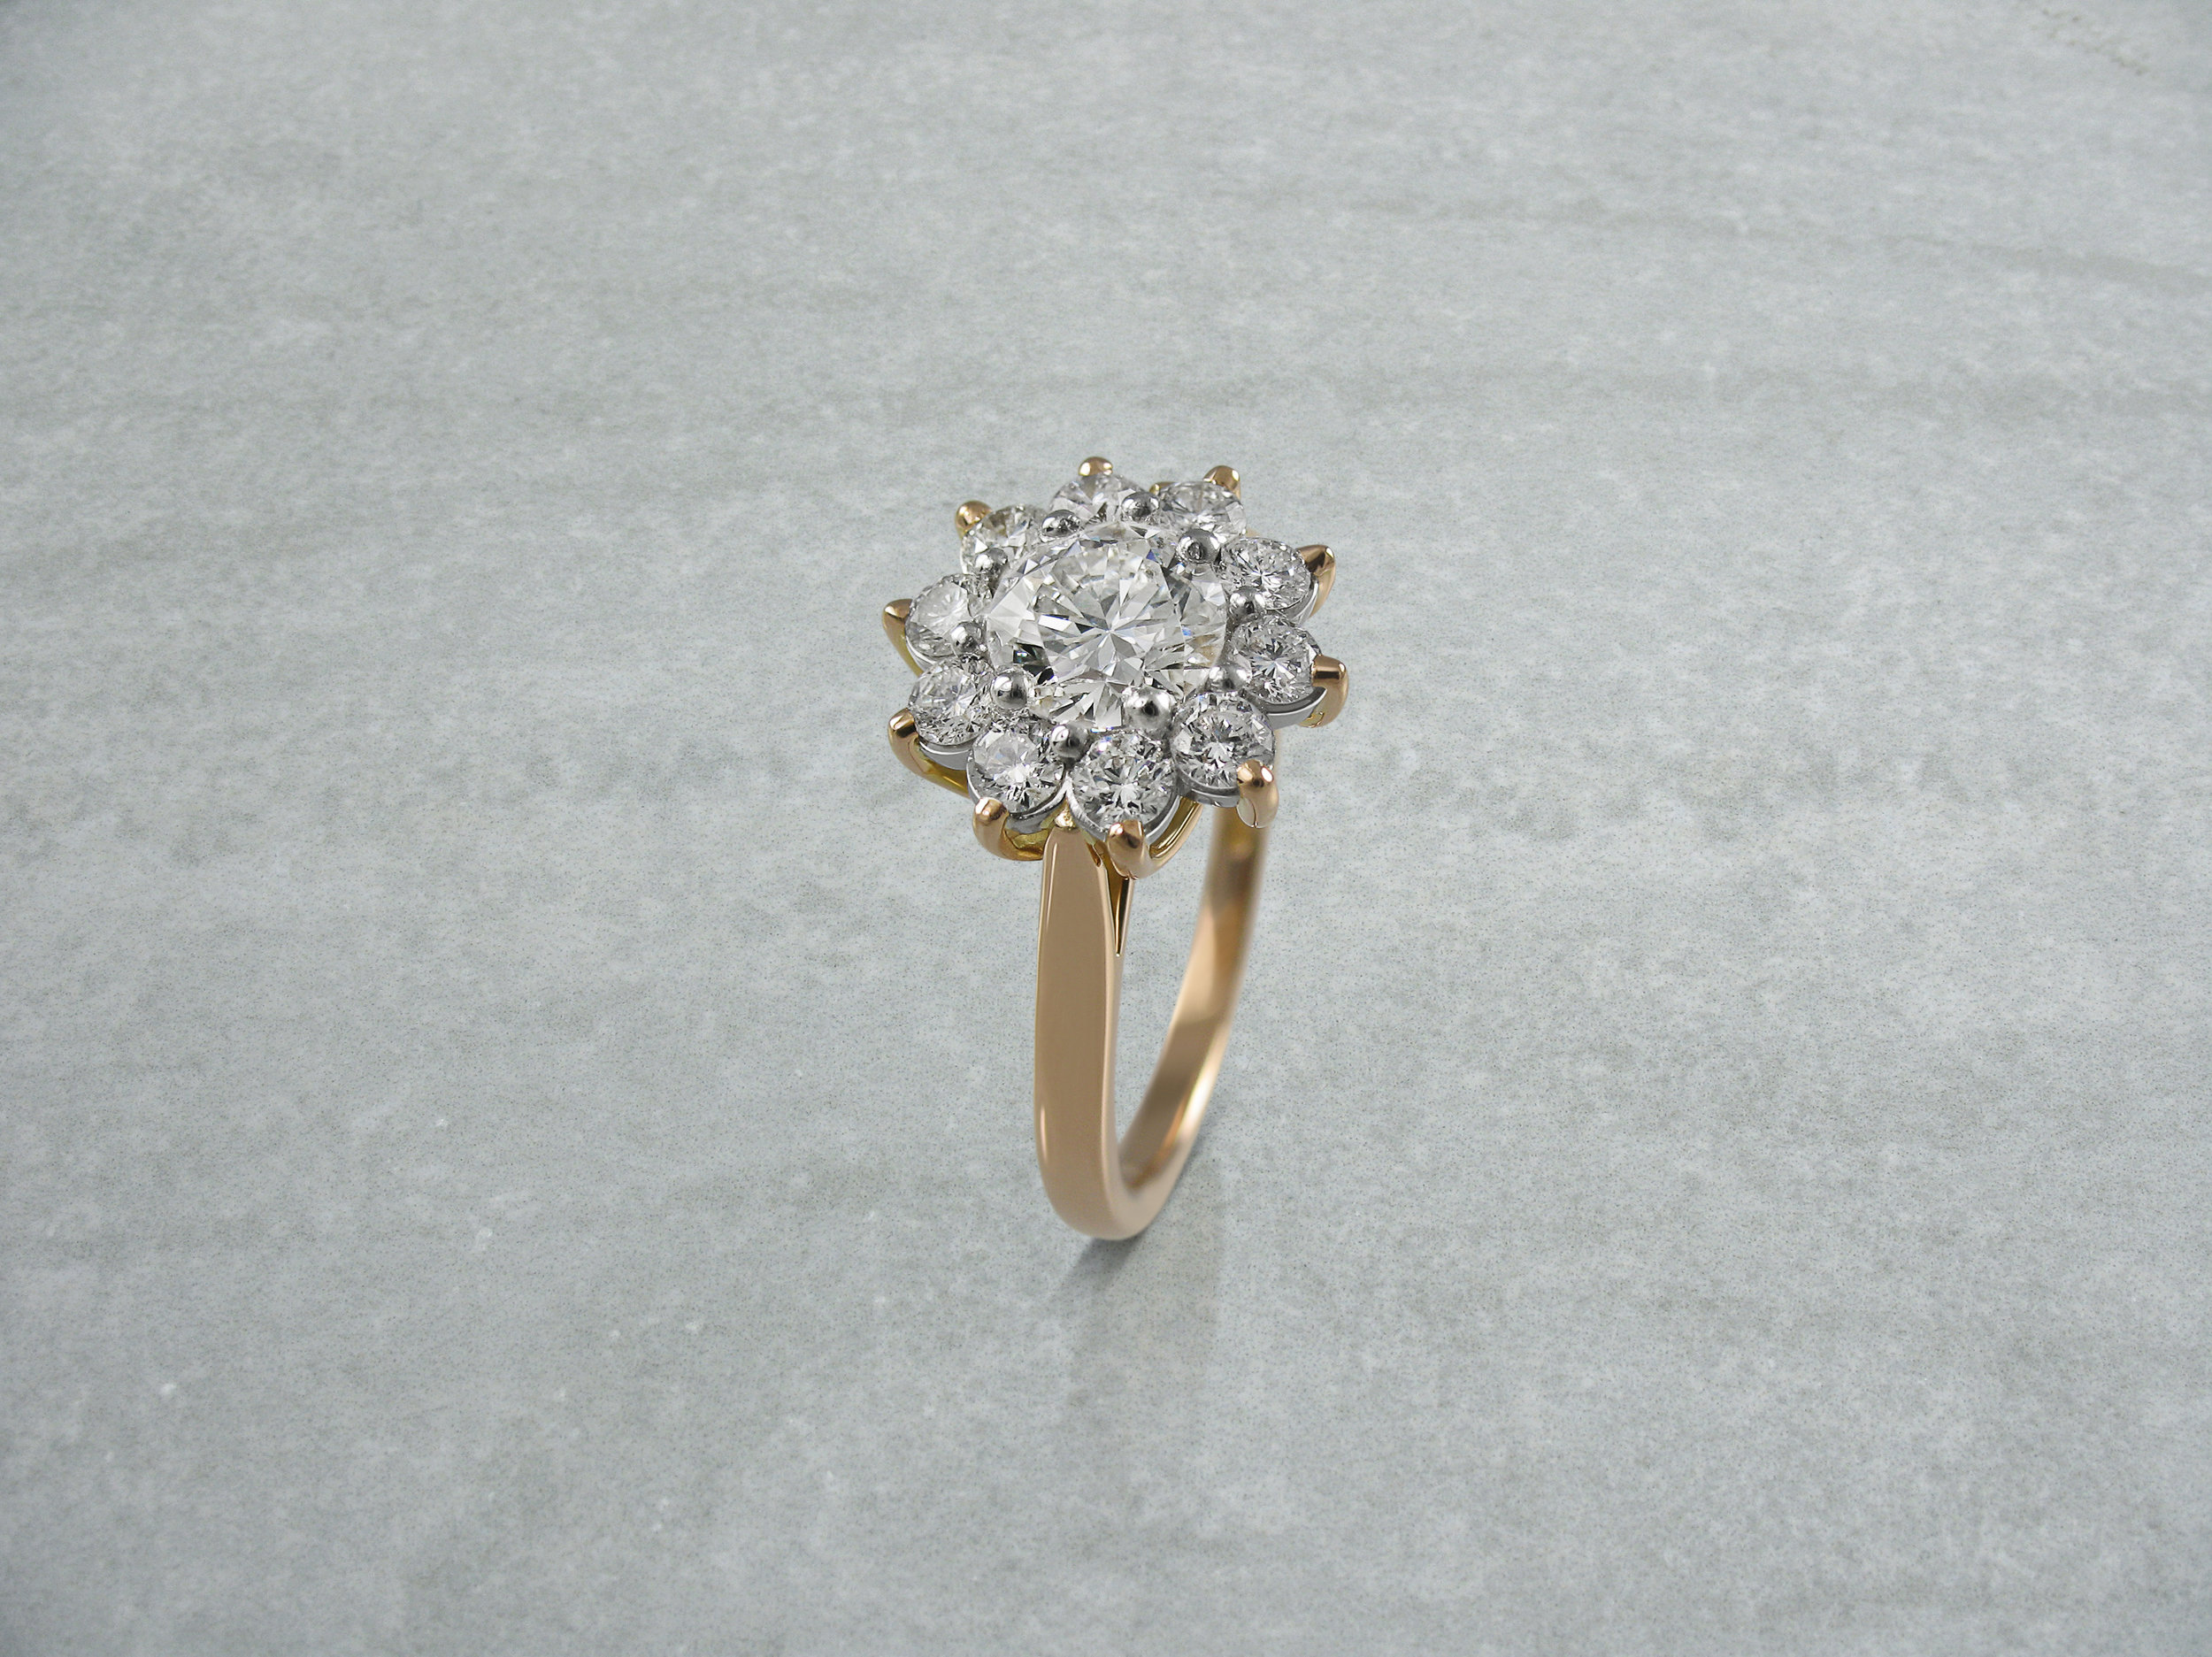 Round brilliant cut diamond rose gold cluster engagement ring